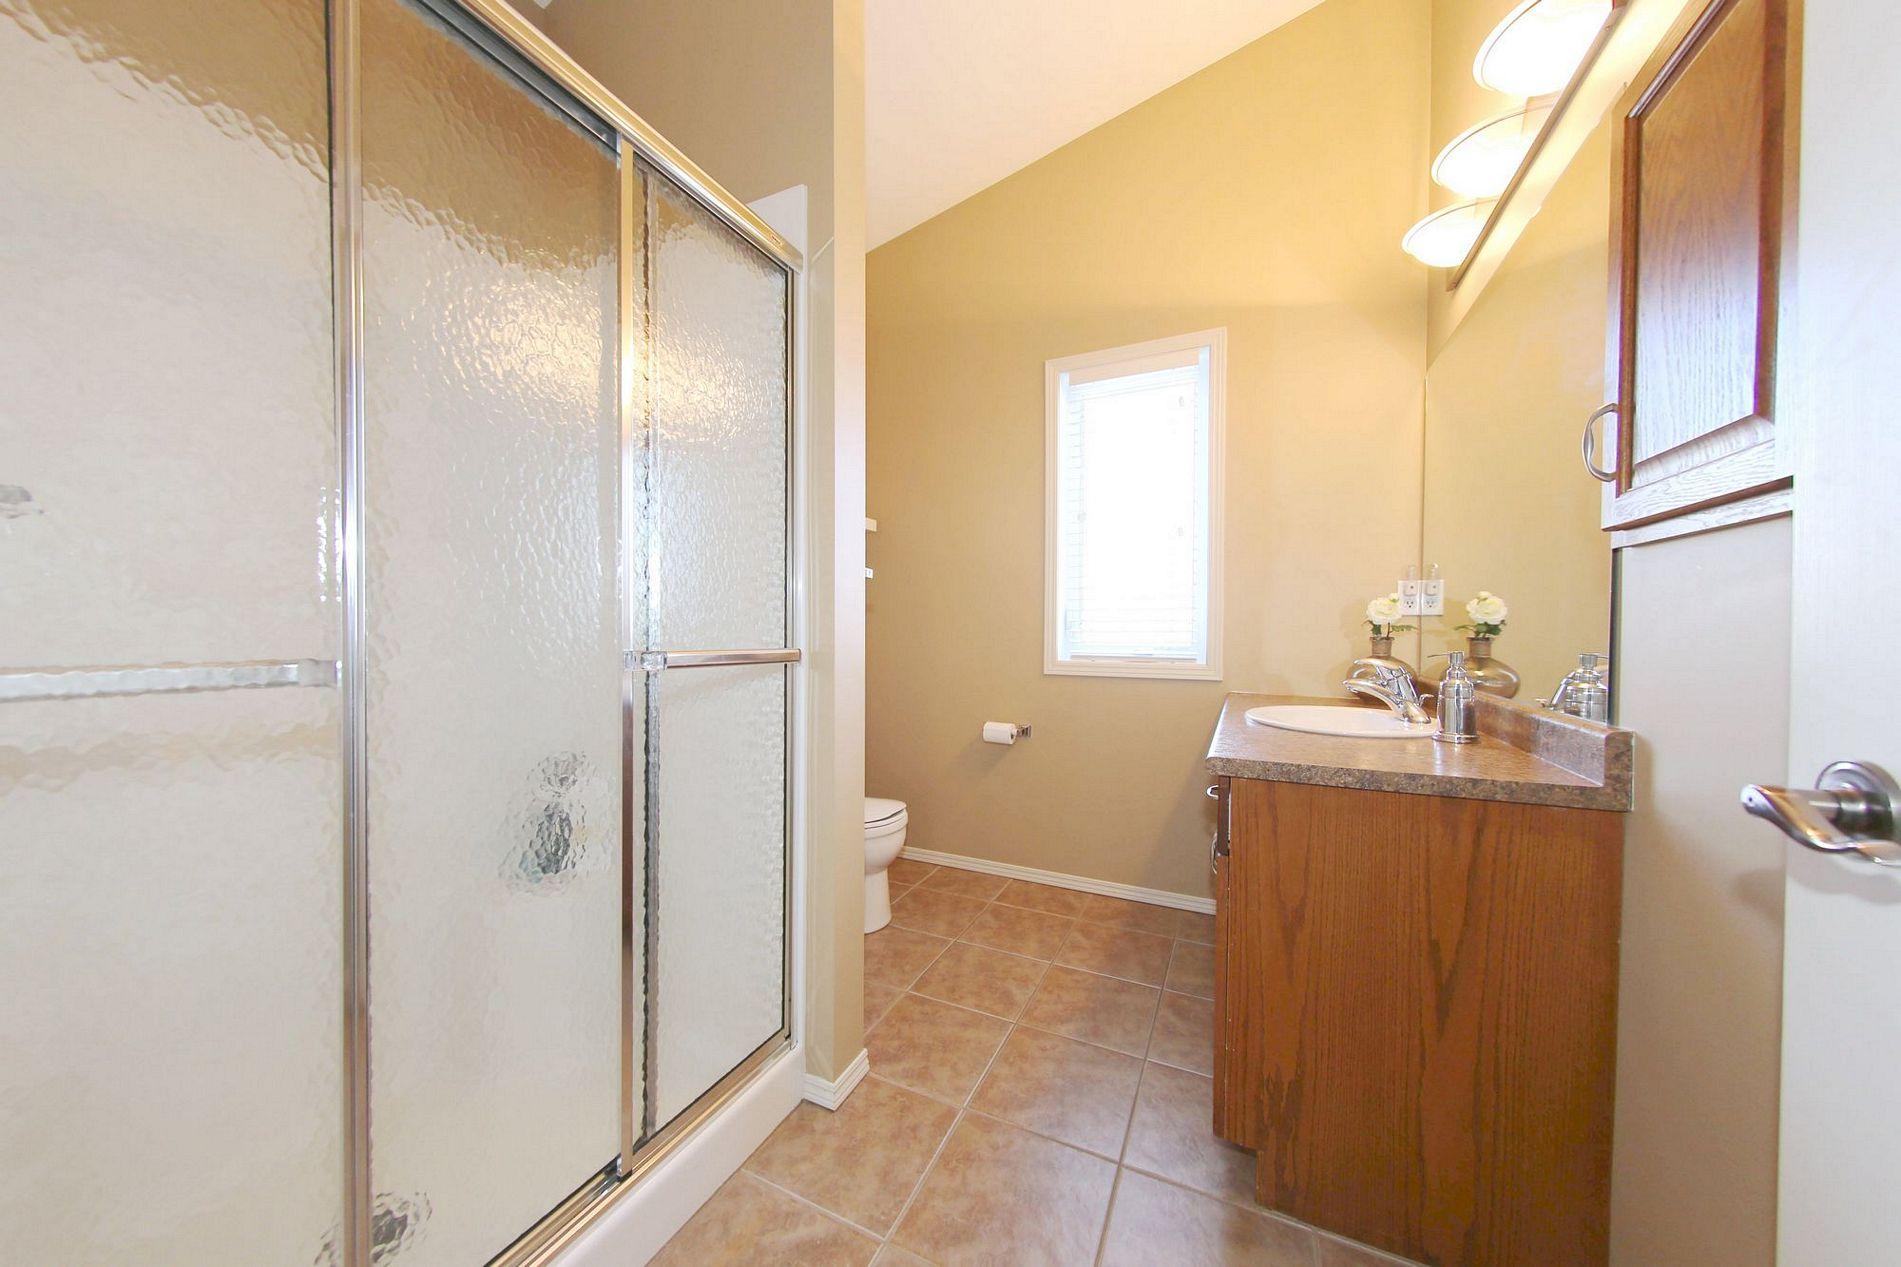 10 Phimister Close, Winnipeg, Manitoba  R3Y 1Y5 - Photo 13 - 1503514